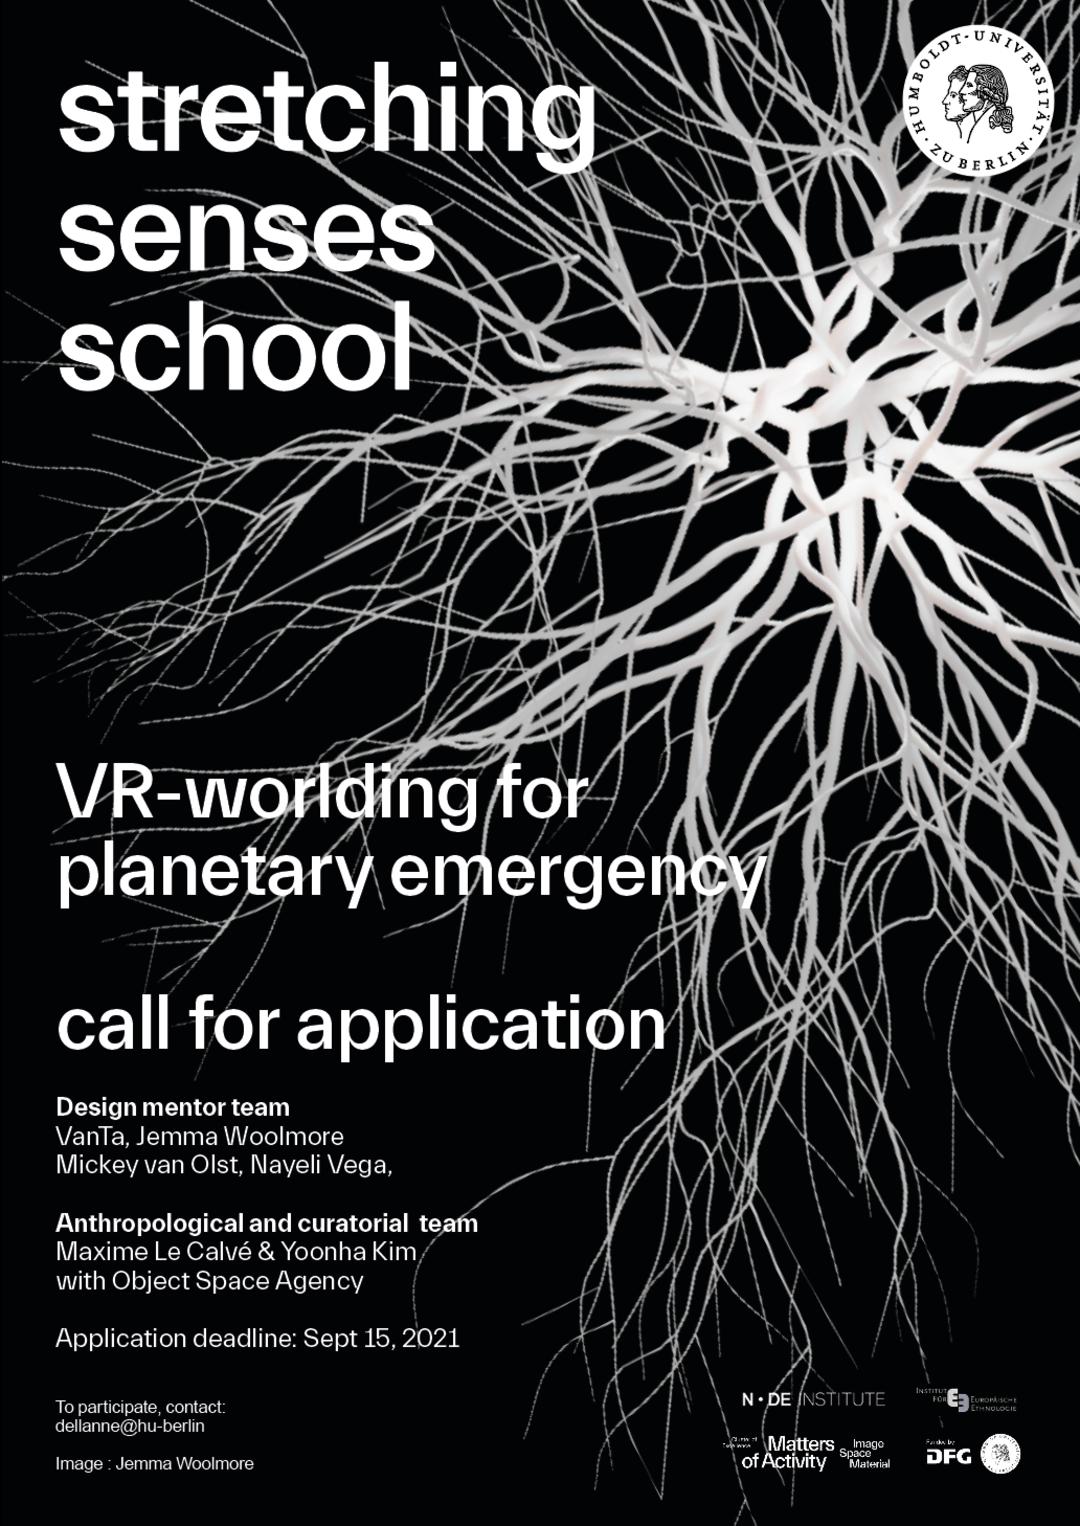 Poster »stretching senses school«, Image: Jemma Woolstone